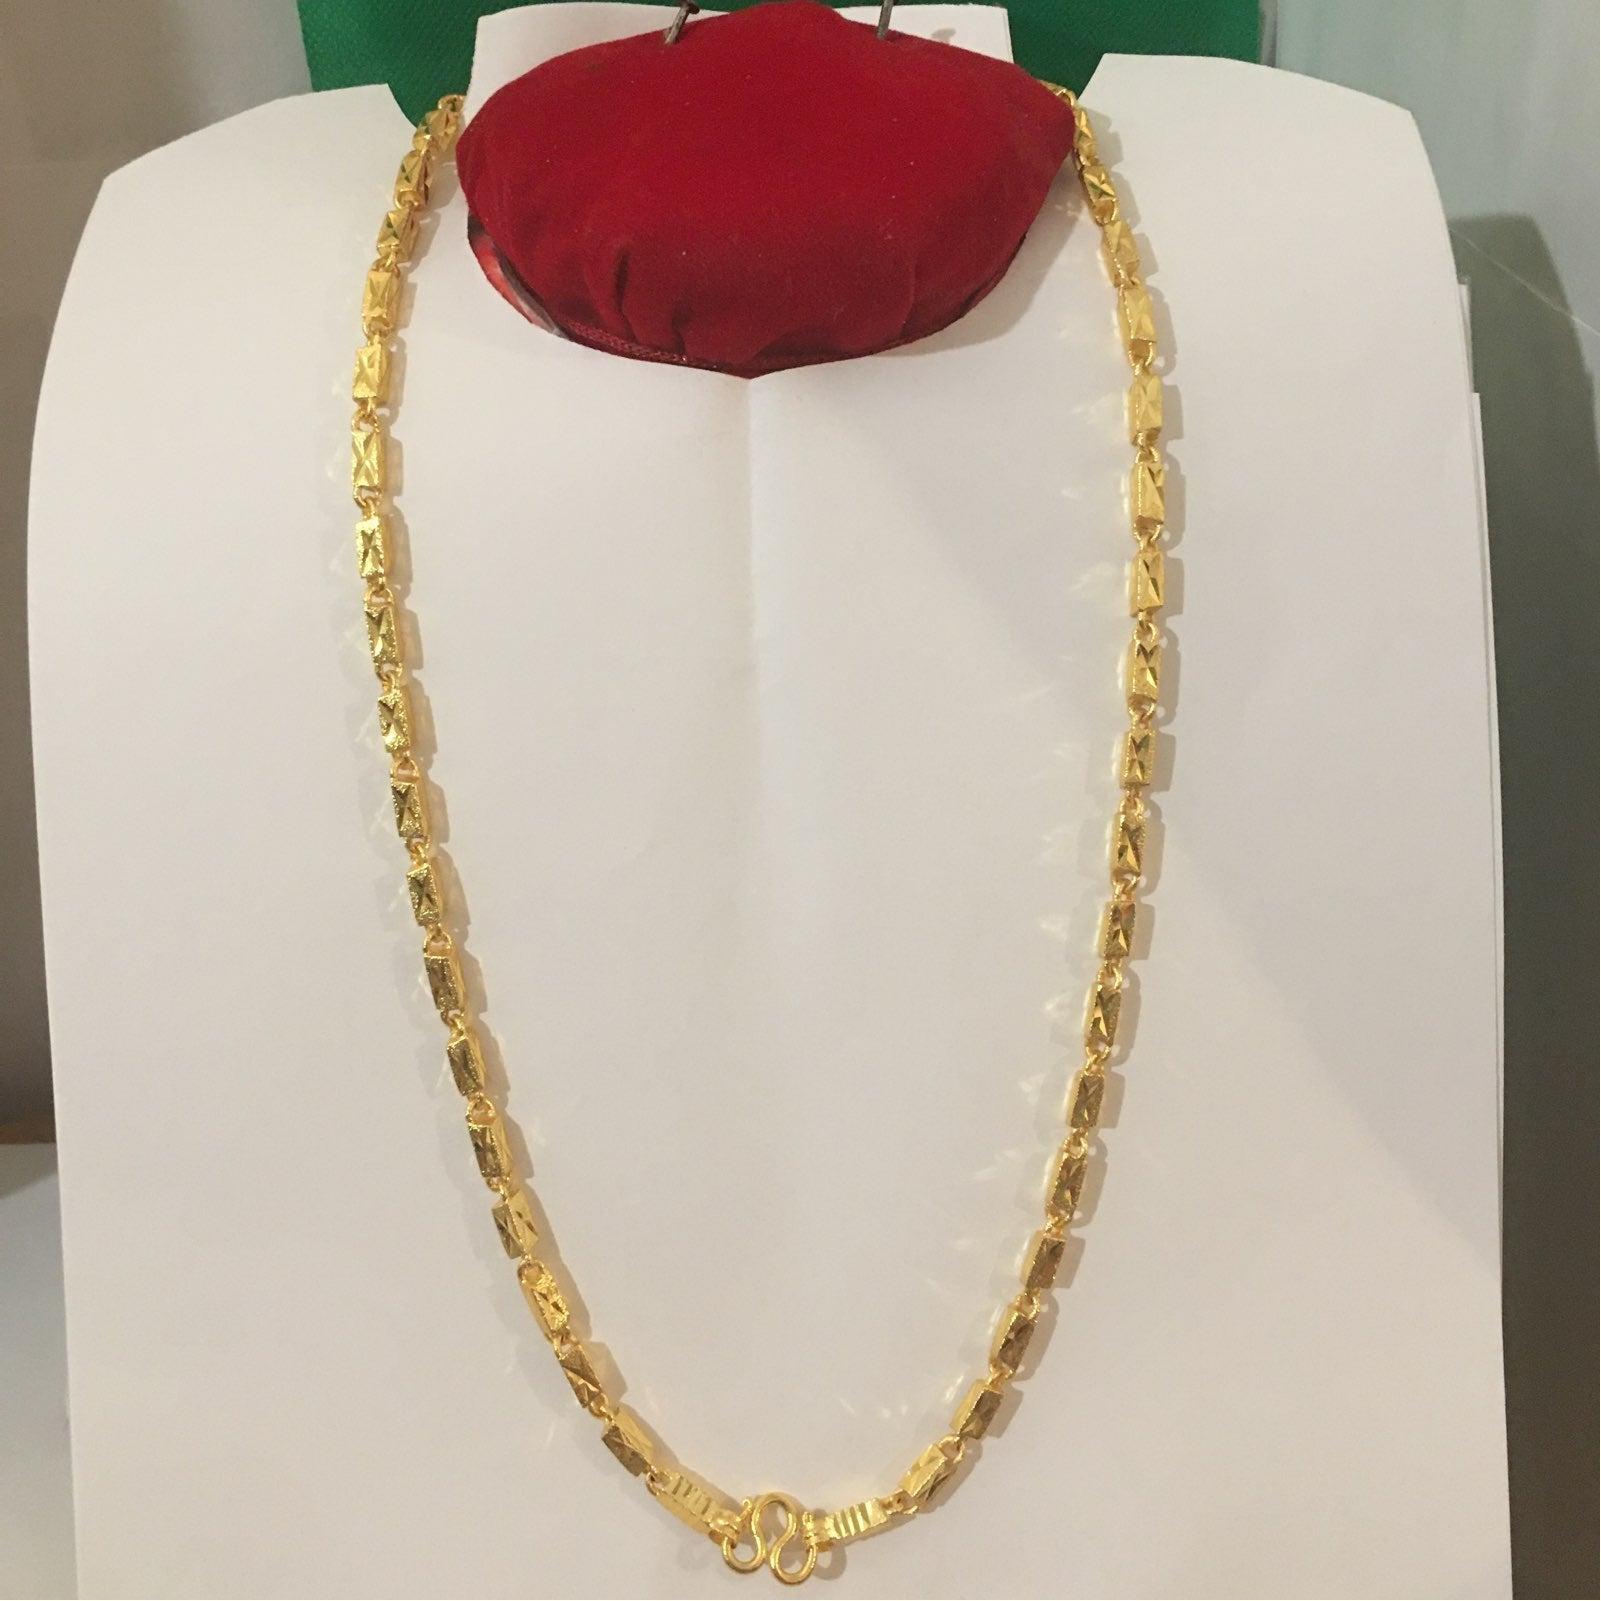 "Bangkok Gold Necklace 24"" long & 56g"